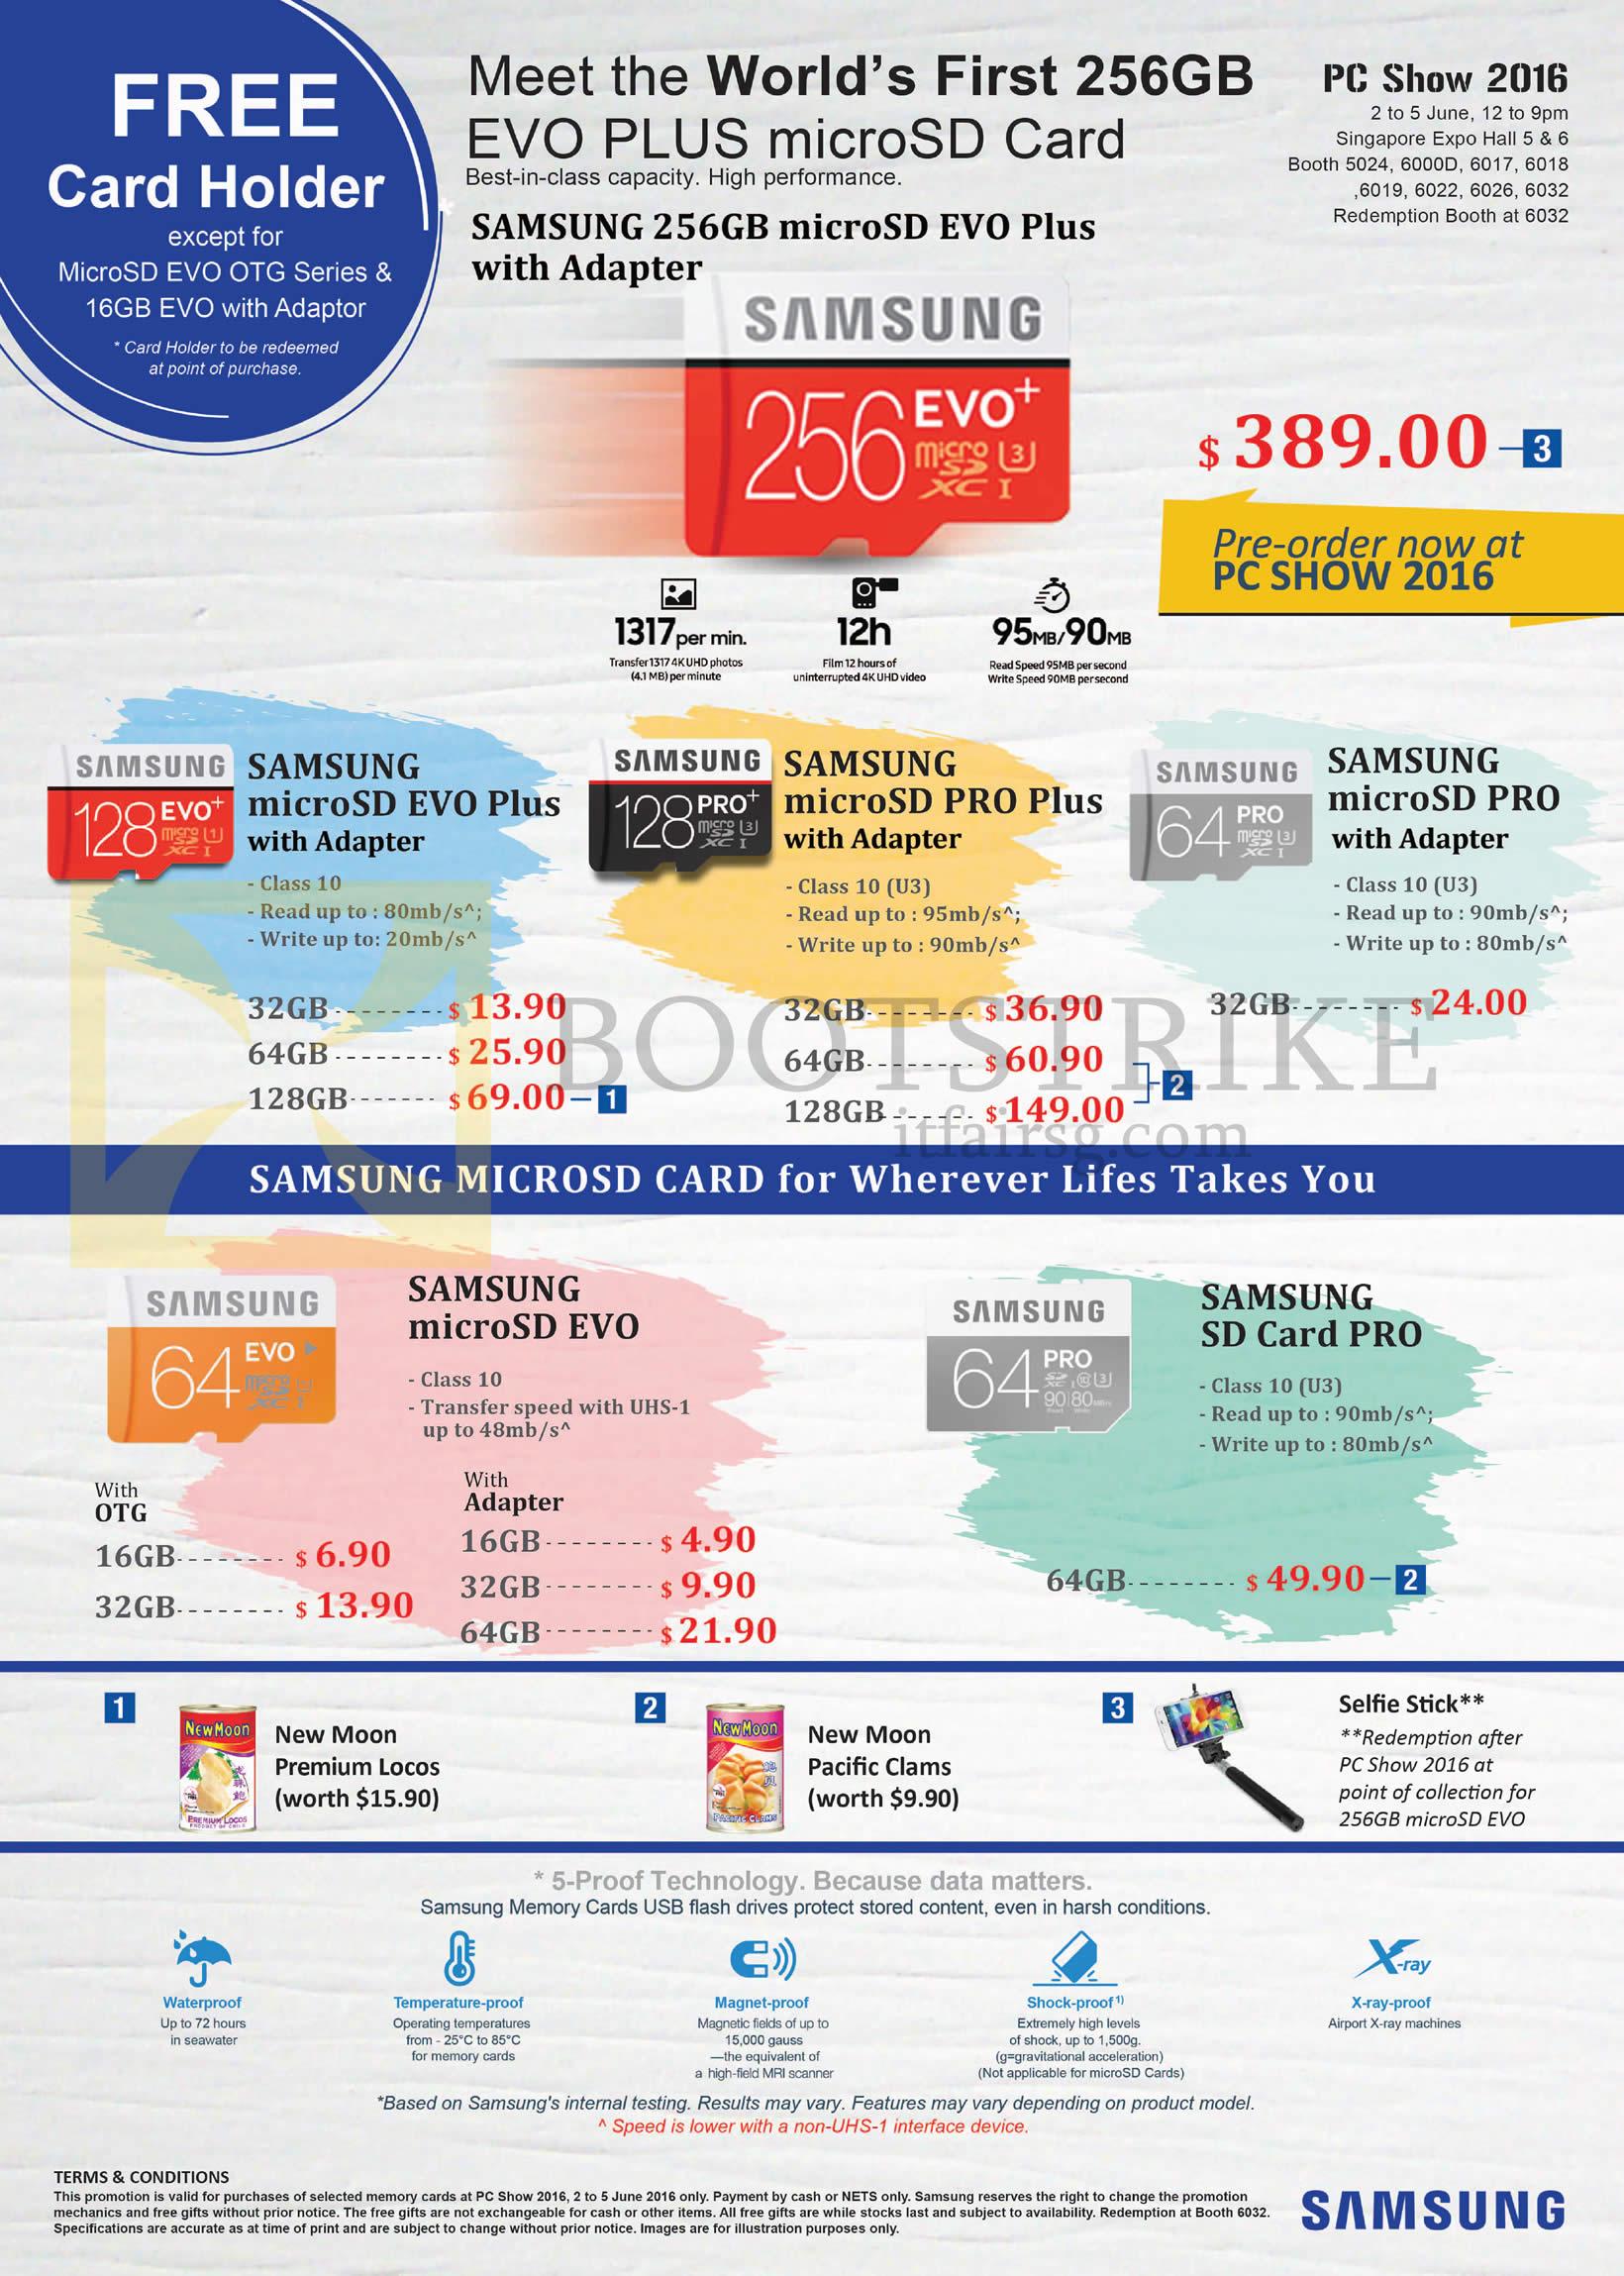 PC SHOW 2016 price list image brochure of Samsung Flash Memory Cards SD MicroSD Evo, Pro Plus, MicroSD EVO, SD Card PRO, Free Gifts